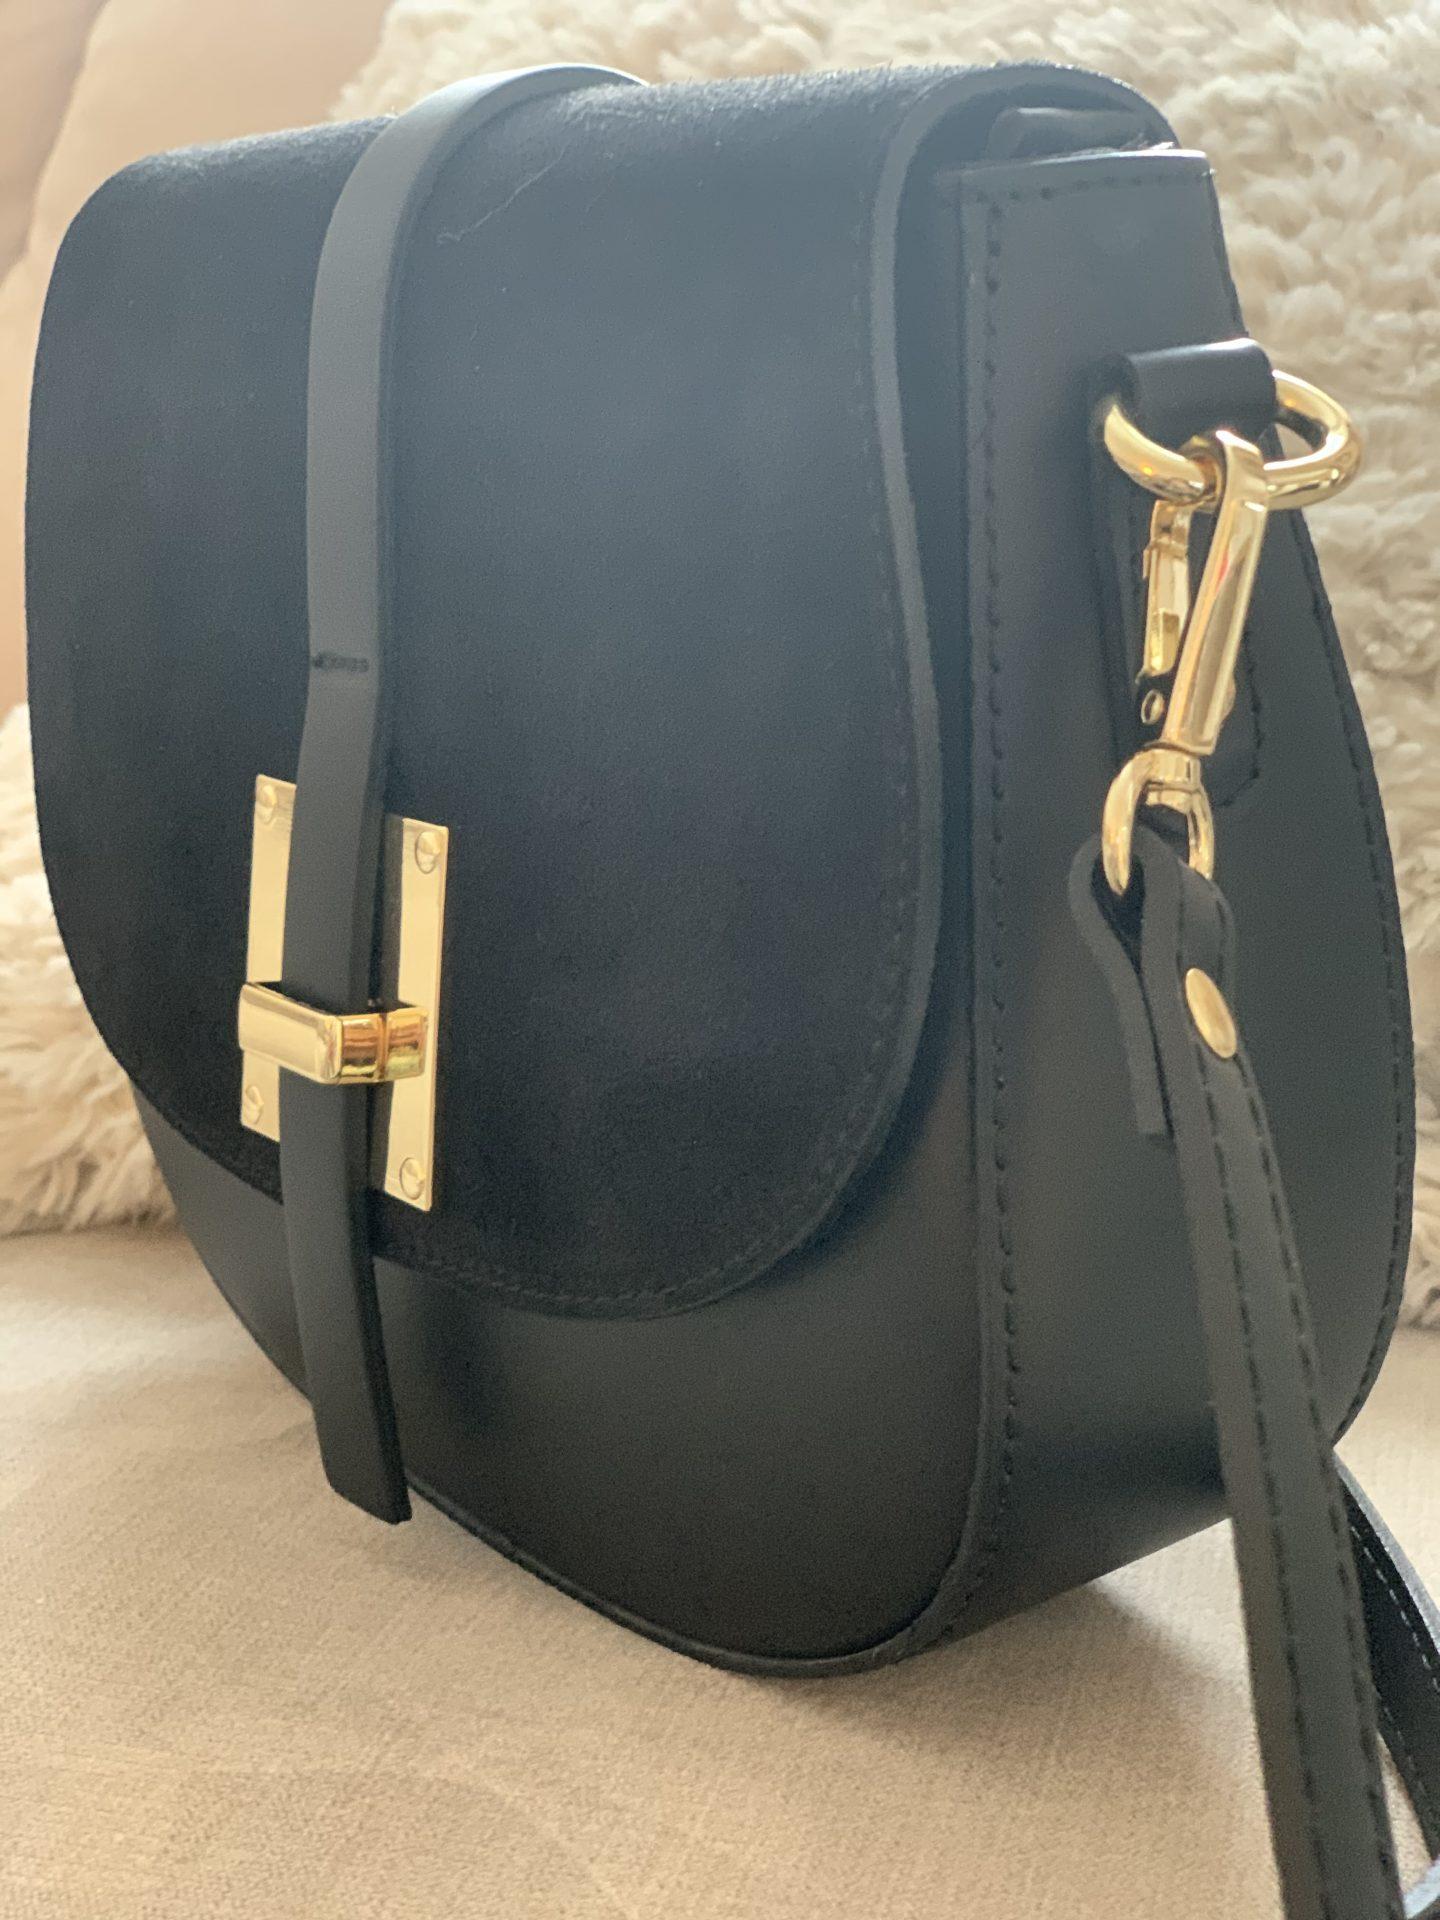 Mum a Porter Ayesha Amato Cross body shoulder bag